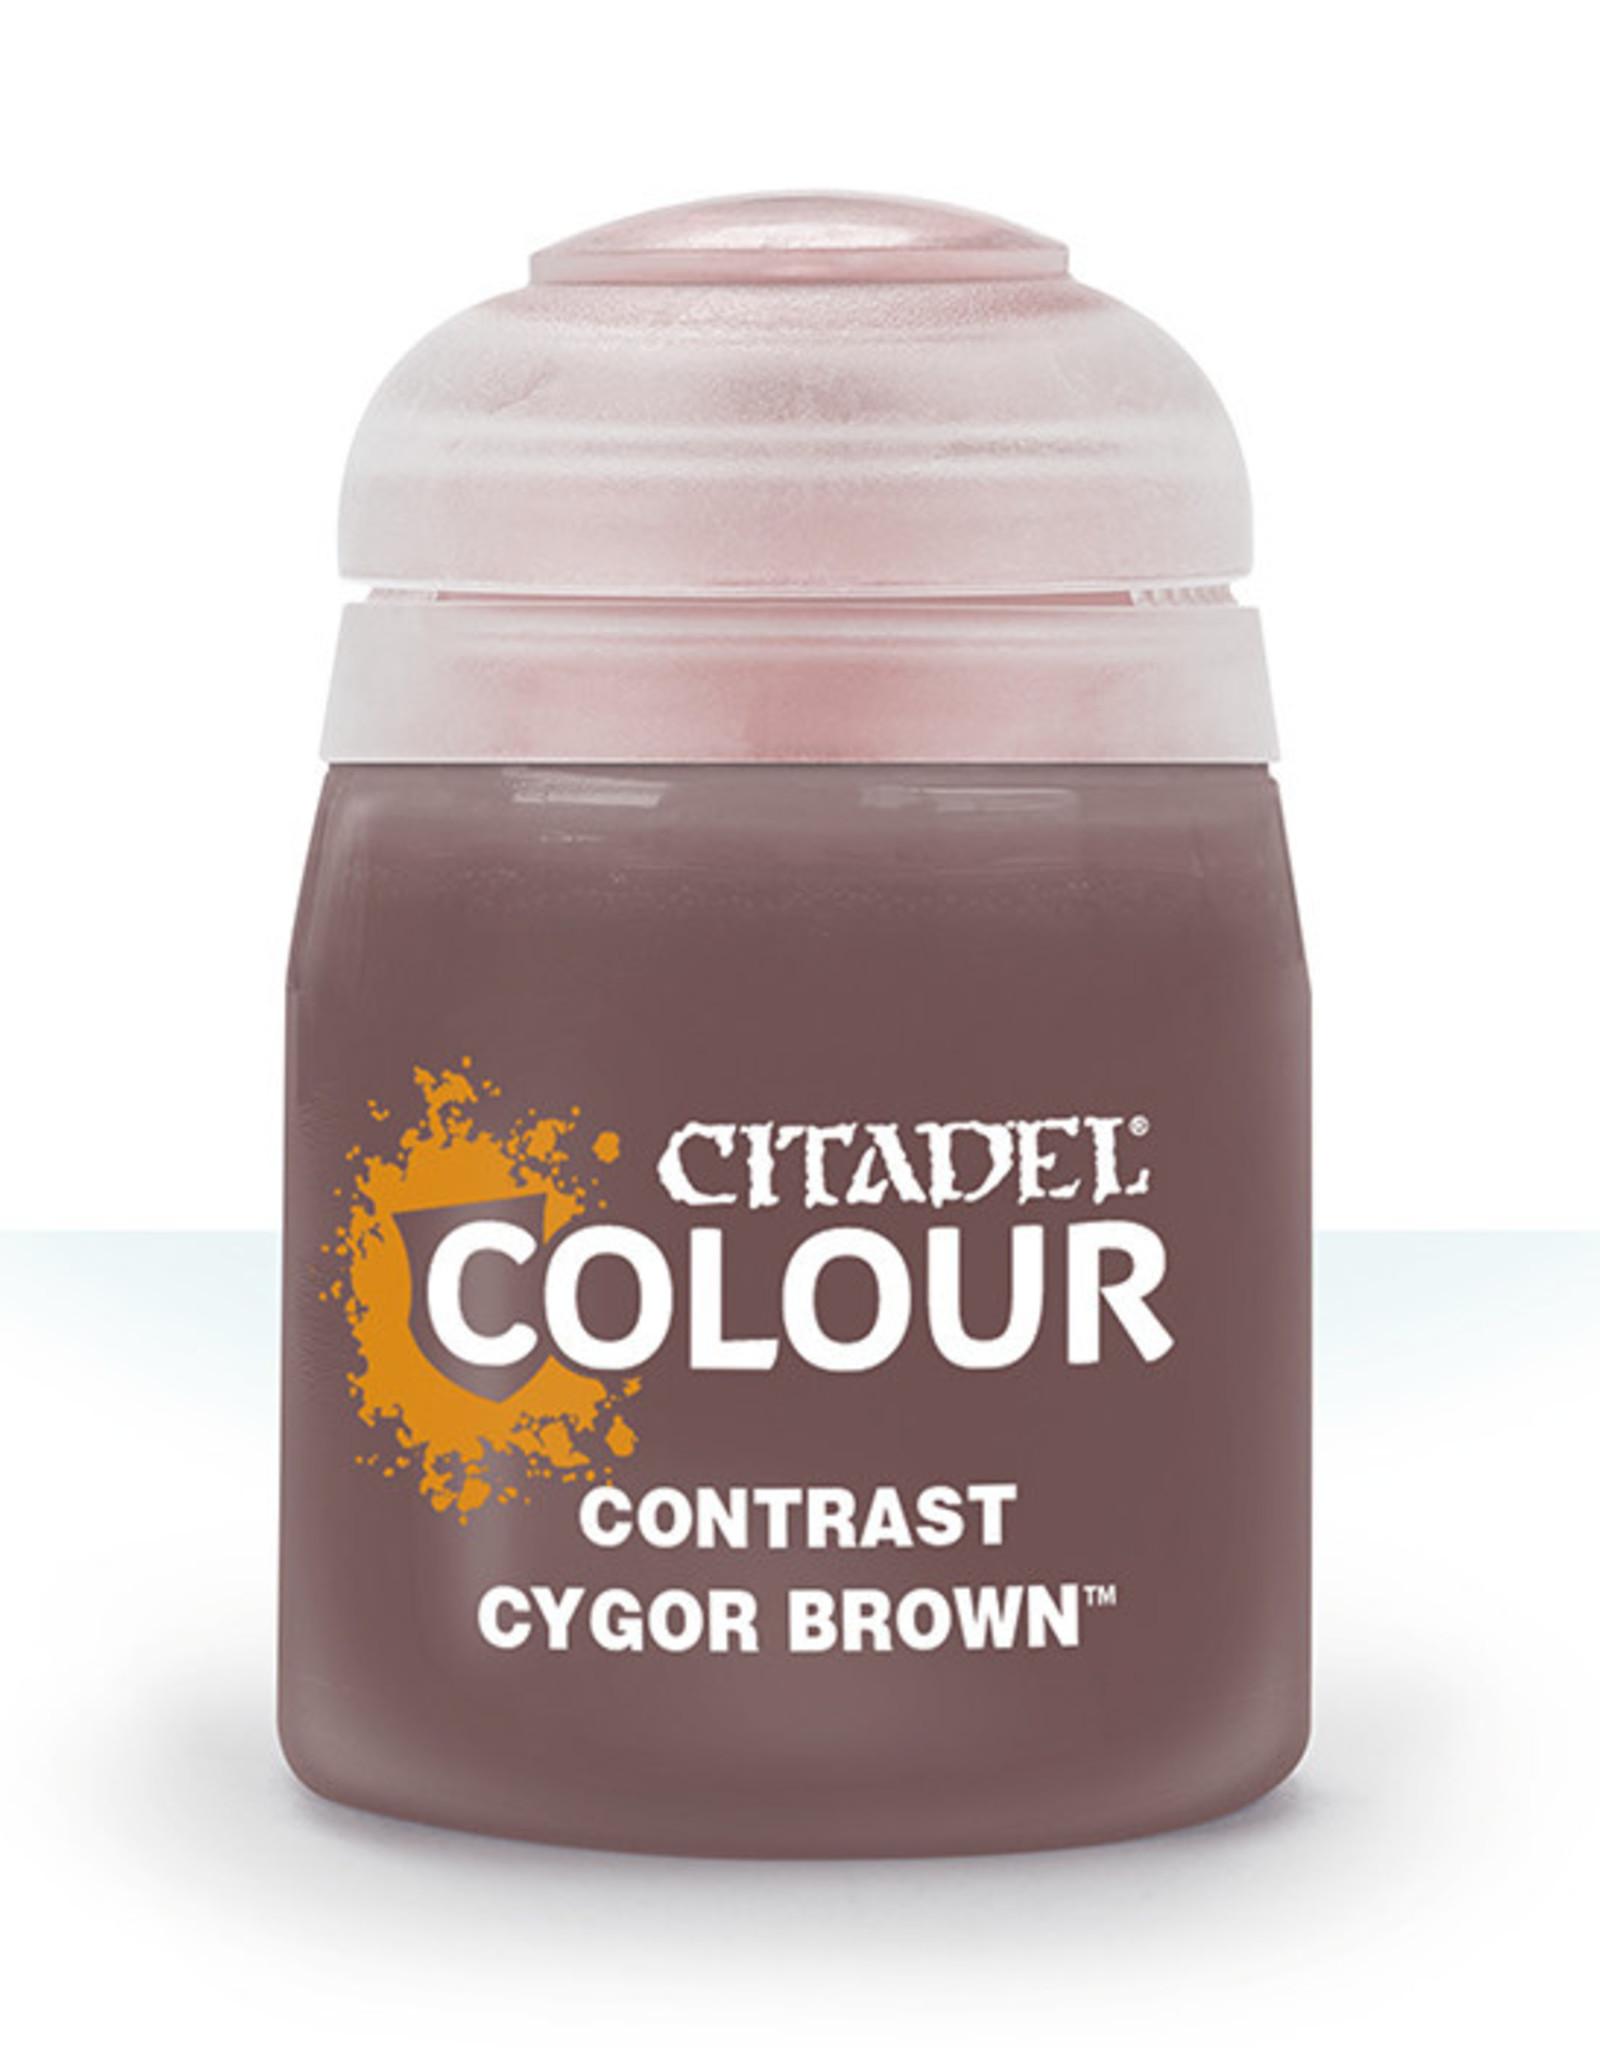 Citadel Citadel Colour: Contrast - Cygor Brown